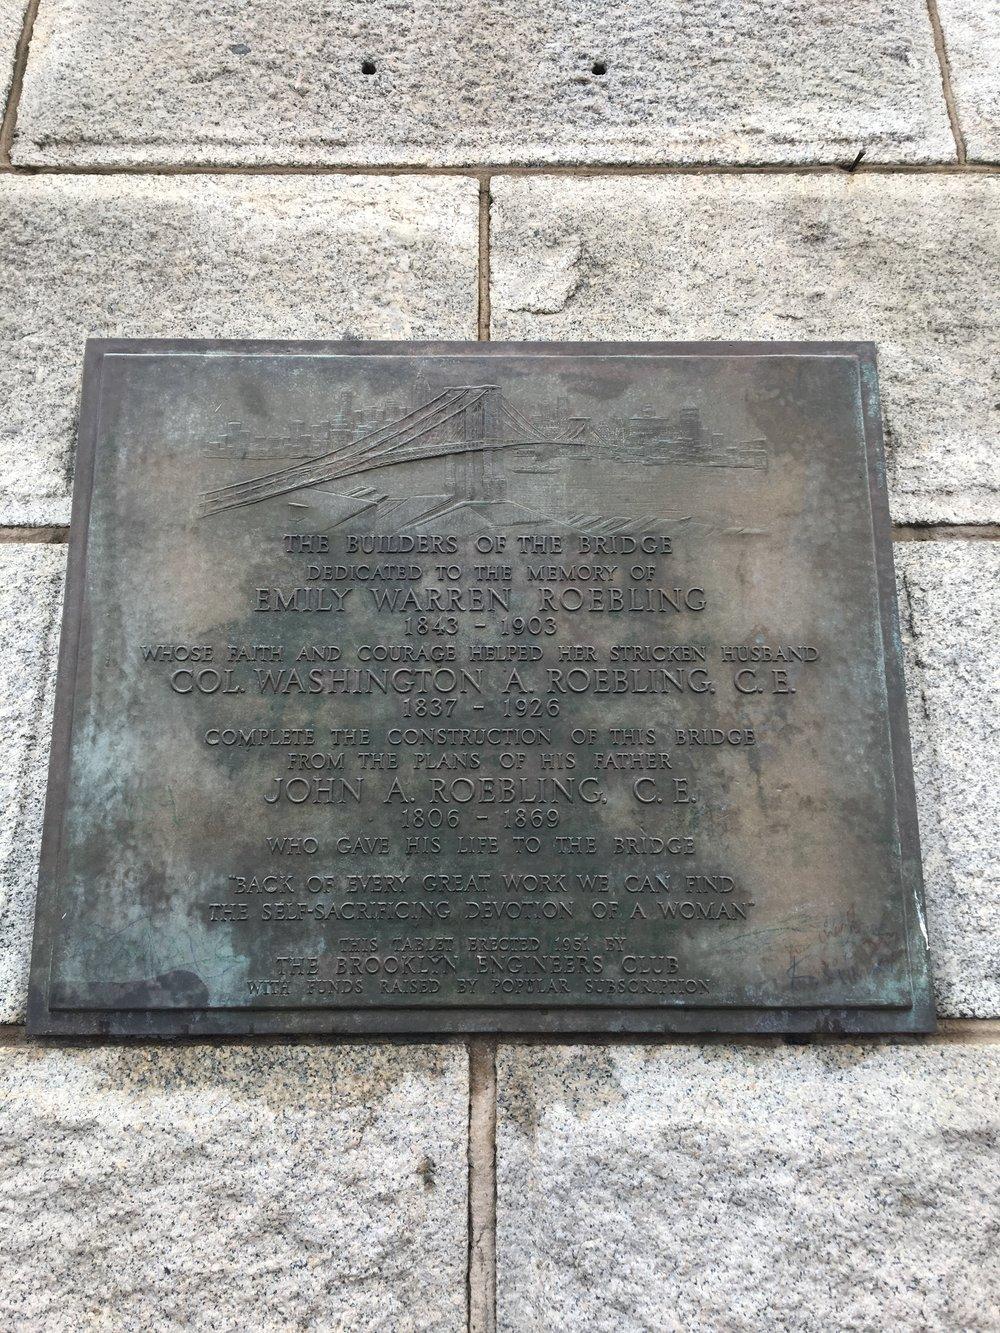 Emily Warren Roebling plaque on Brooklyn Bridge, NY